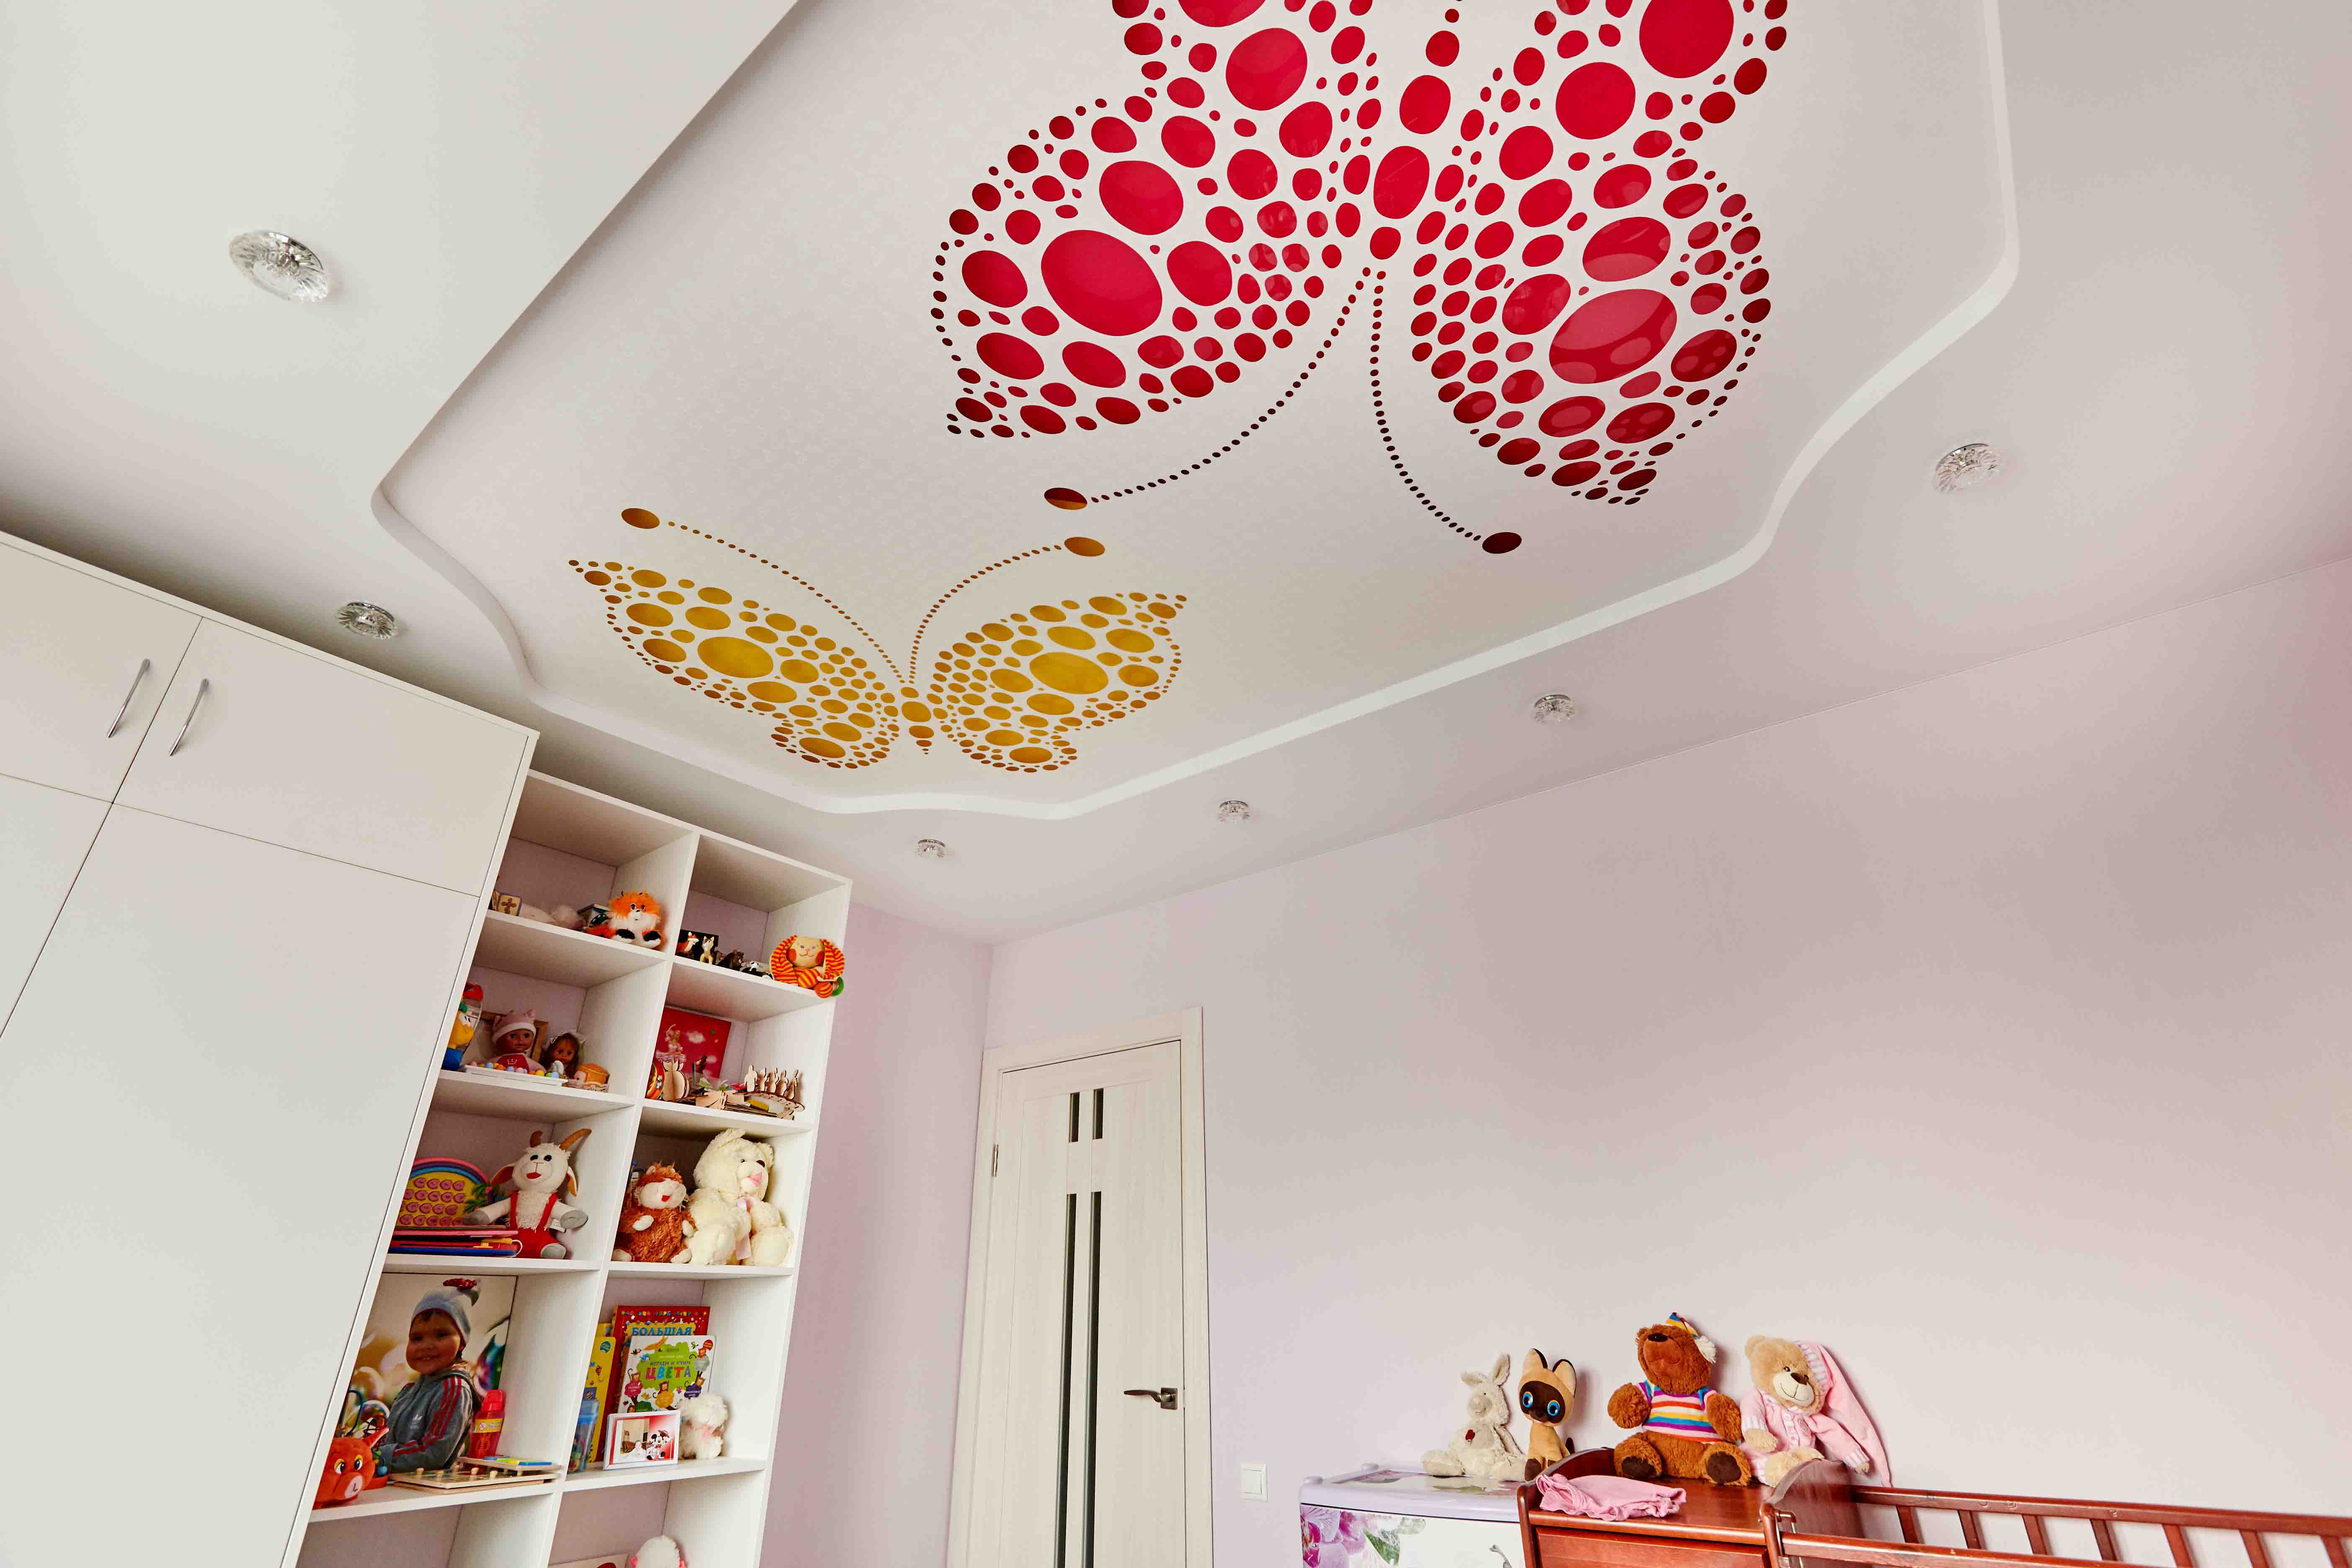 Ceiling the ceilings in Dubai